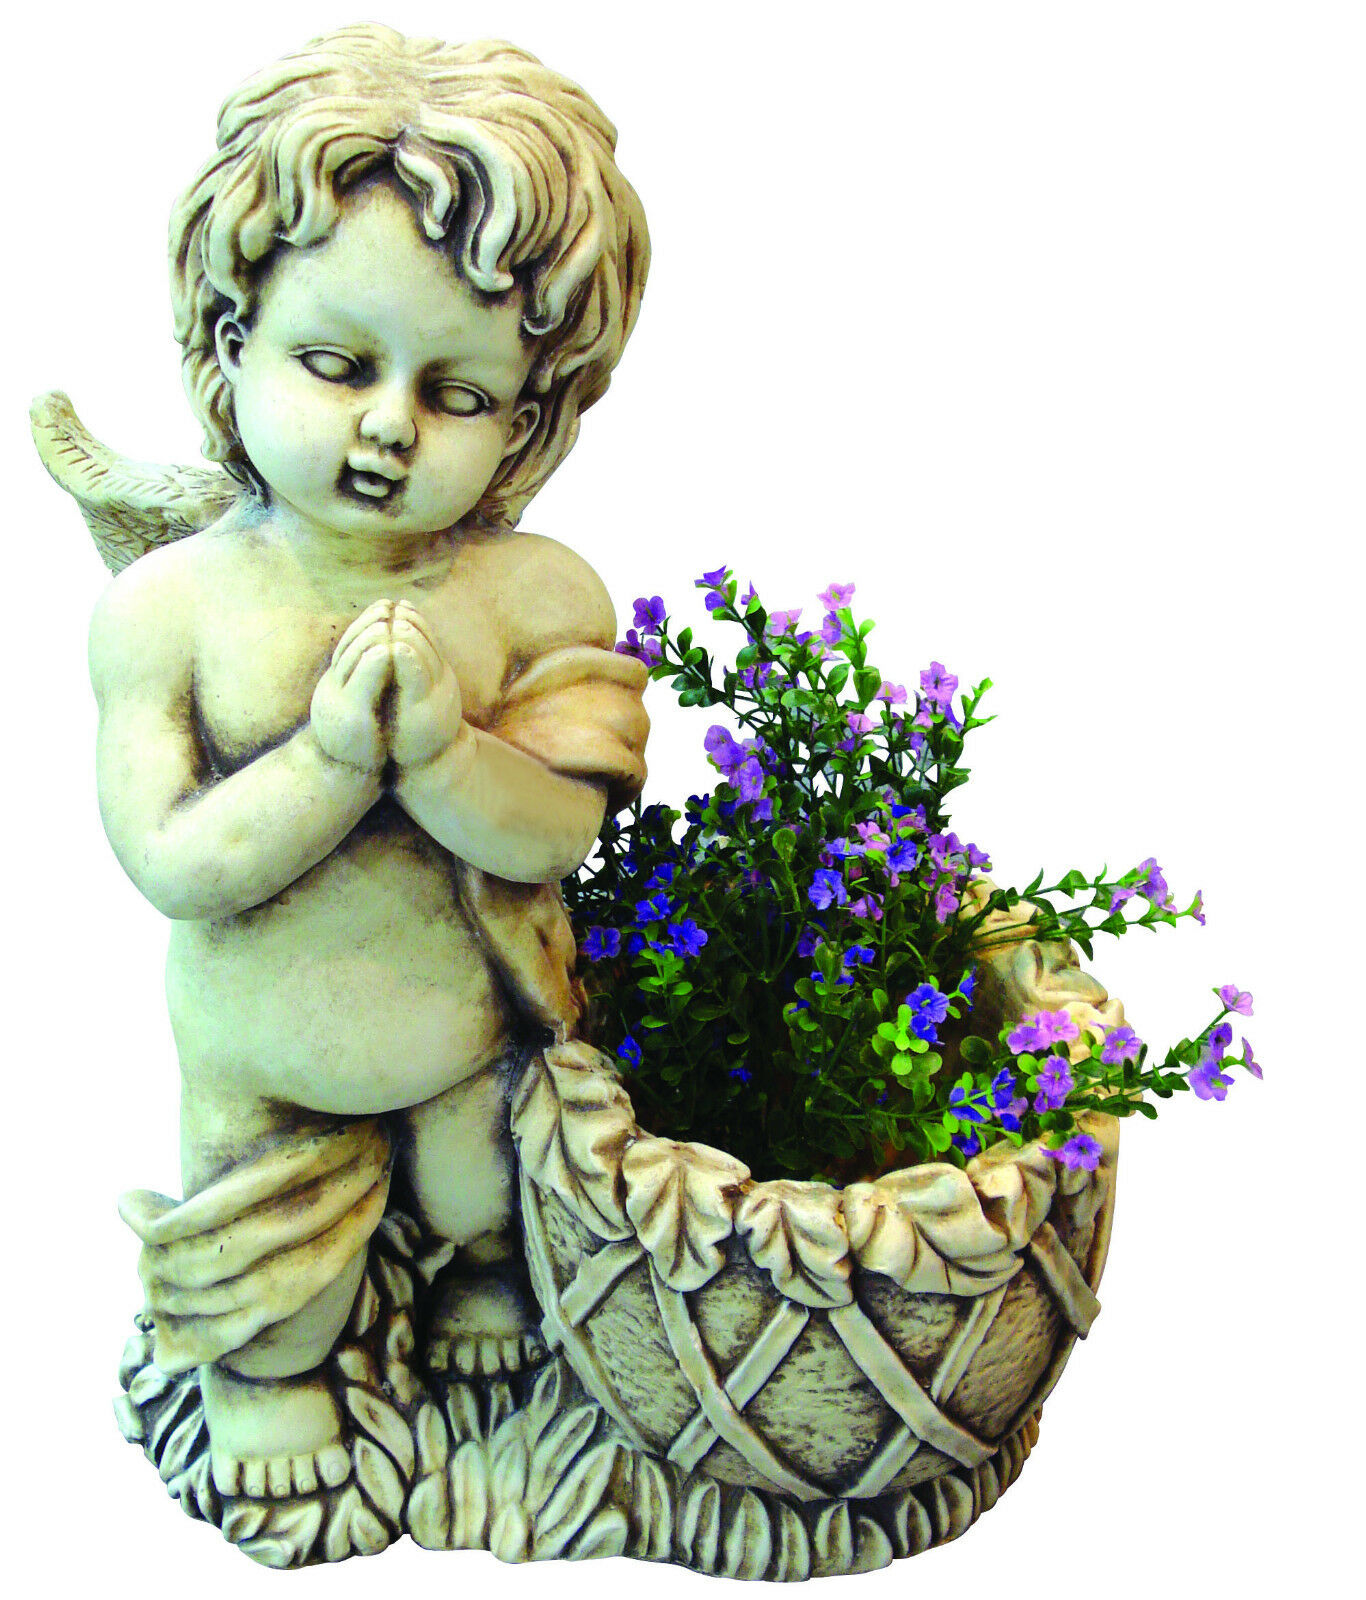 STATUA ANGELO - PUTTO CUSTODE CUSTODE CUSTODE con vaso f0031f